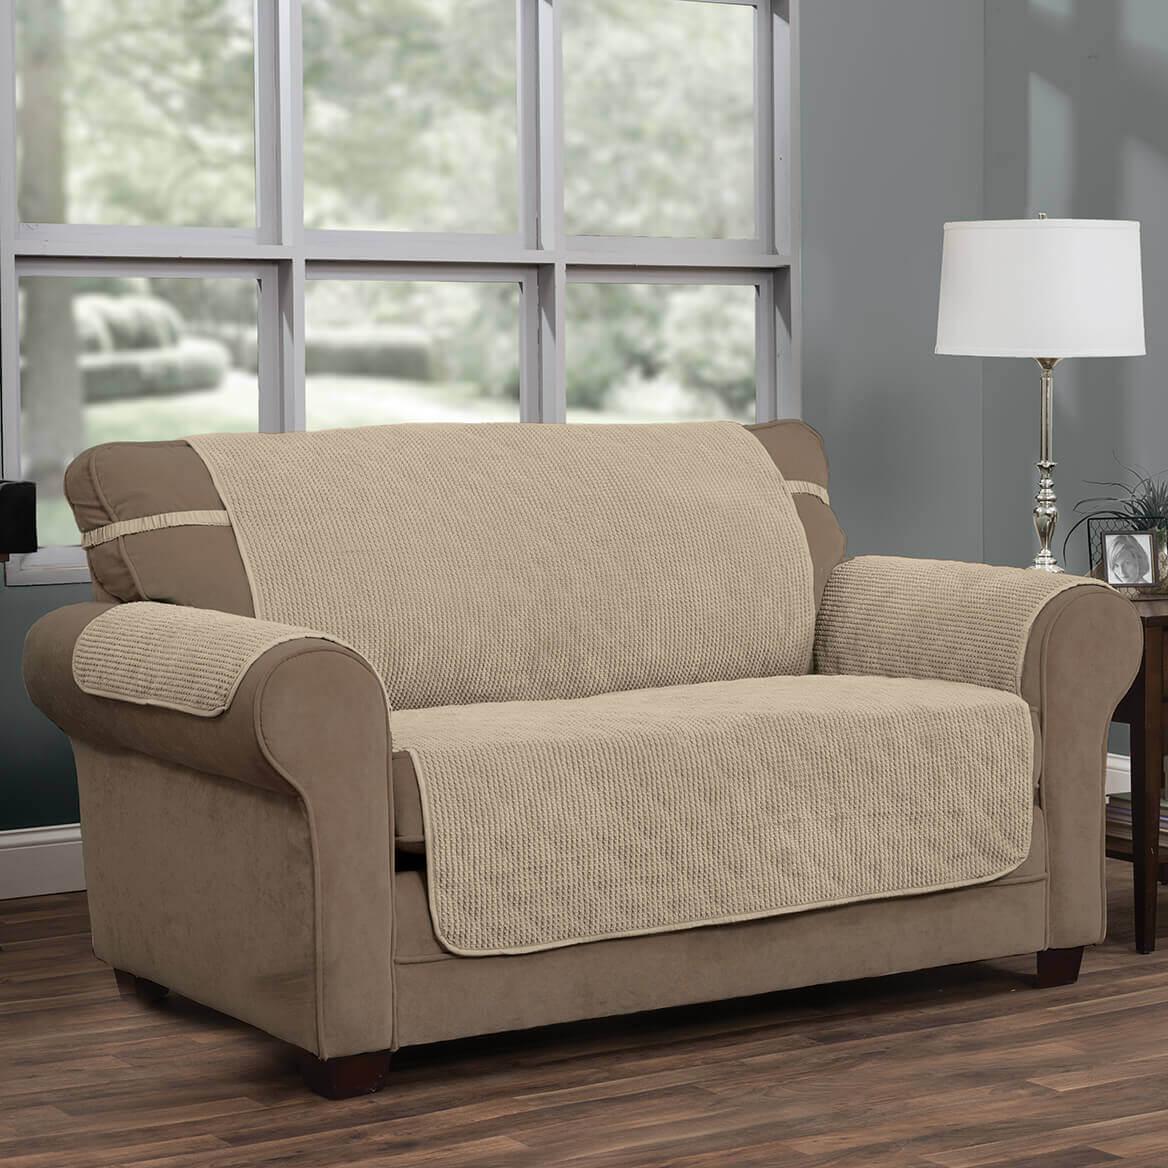 Ripple Plush Sofa Protector-365453